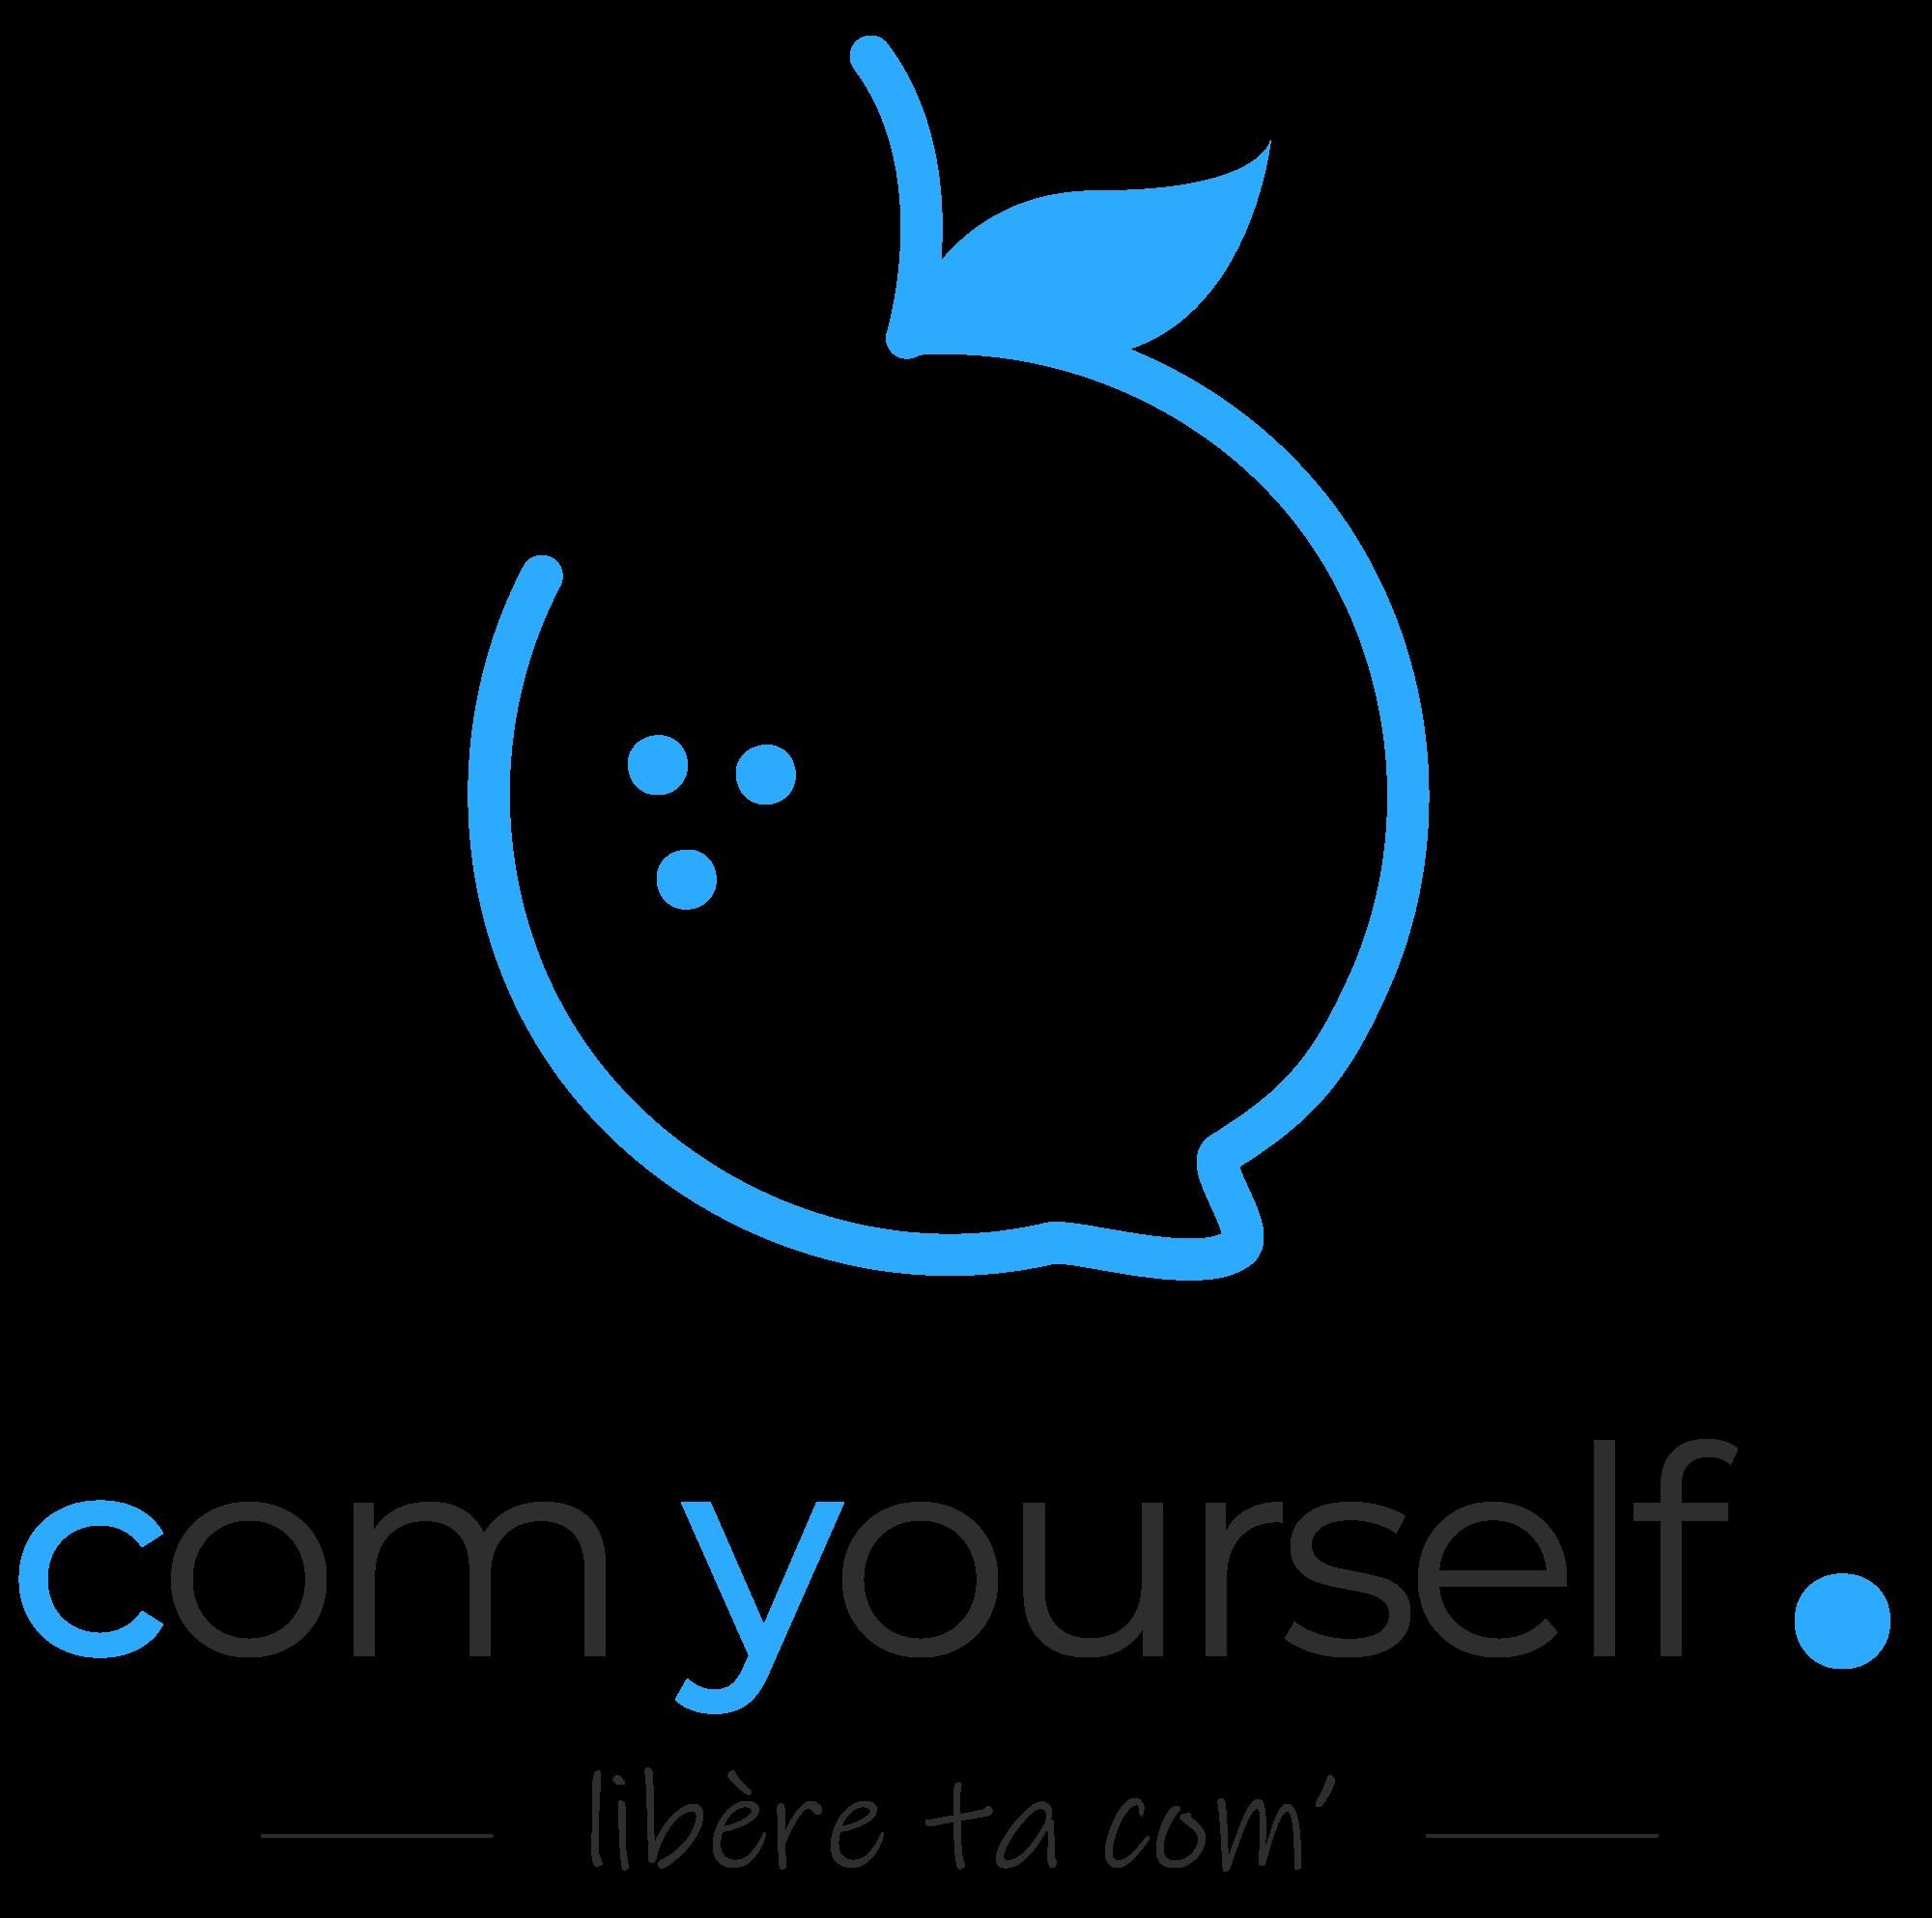 logo2 comyourself